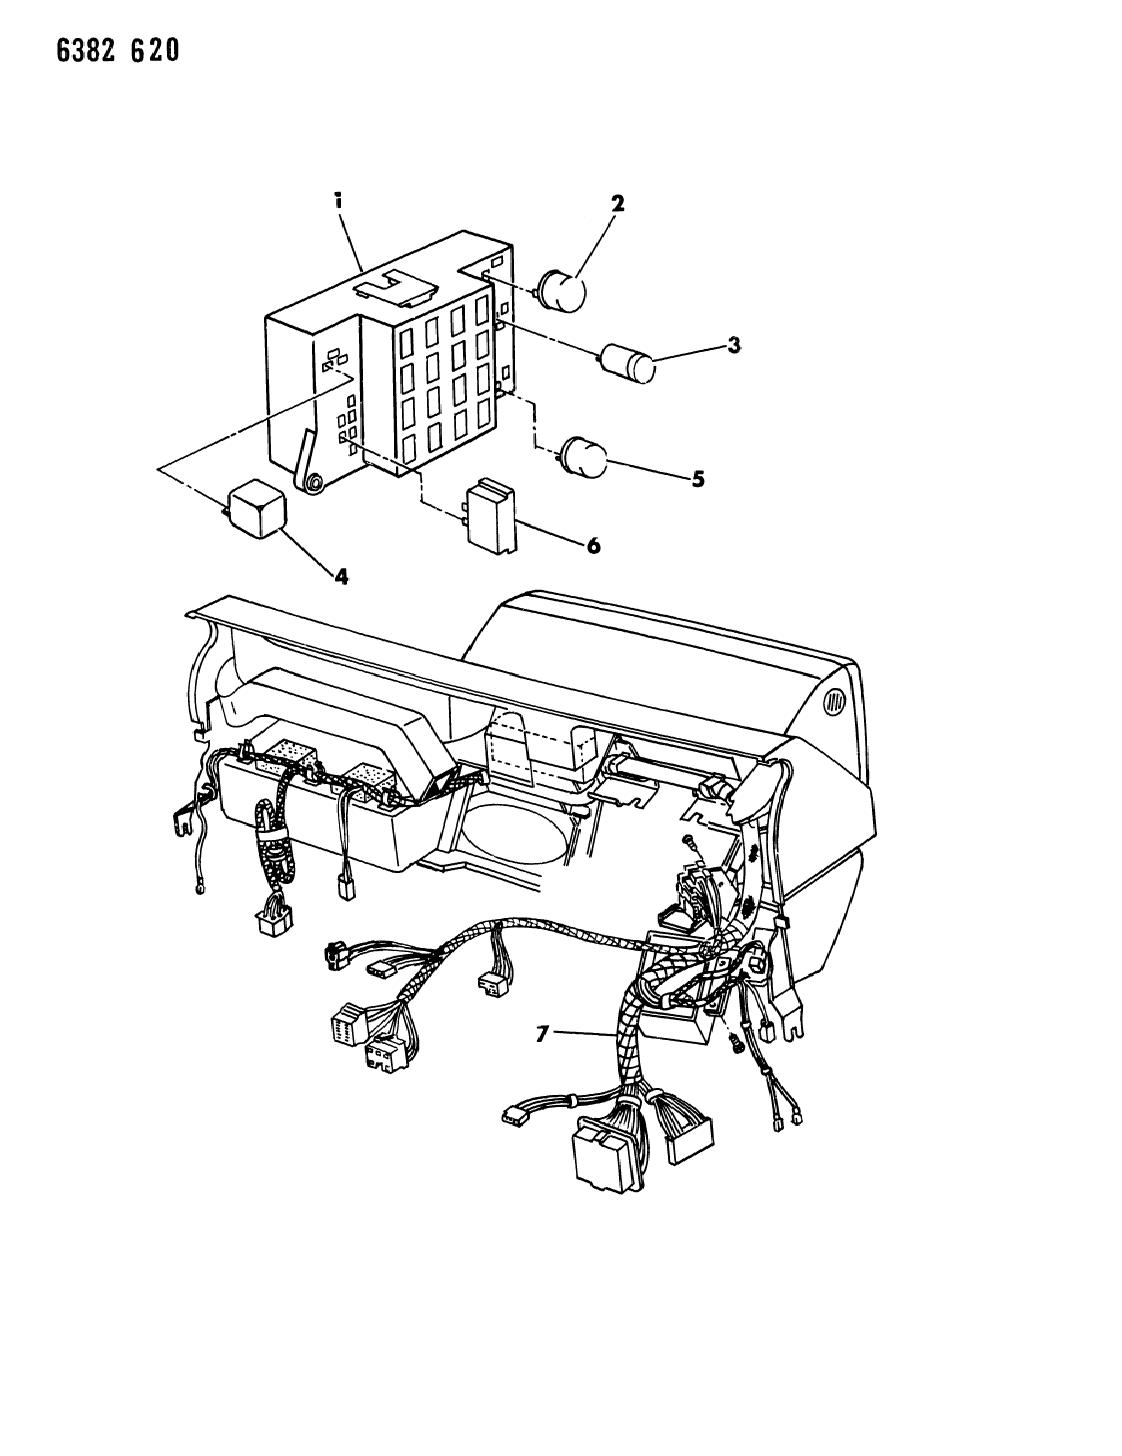 1987 Dodge Dakota Instrument Panel Wiring Mopar Parts Giant Diagram